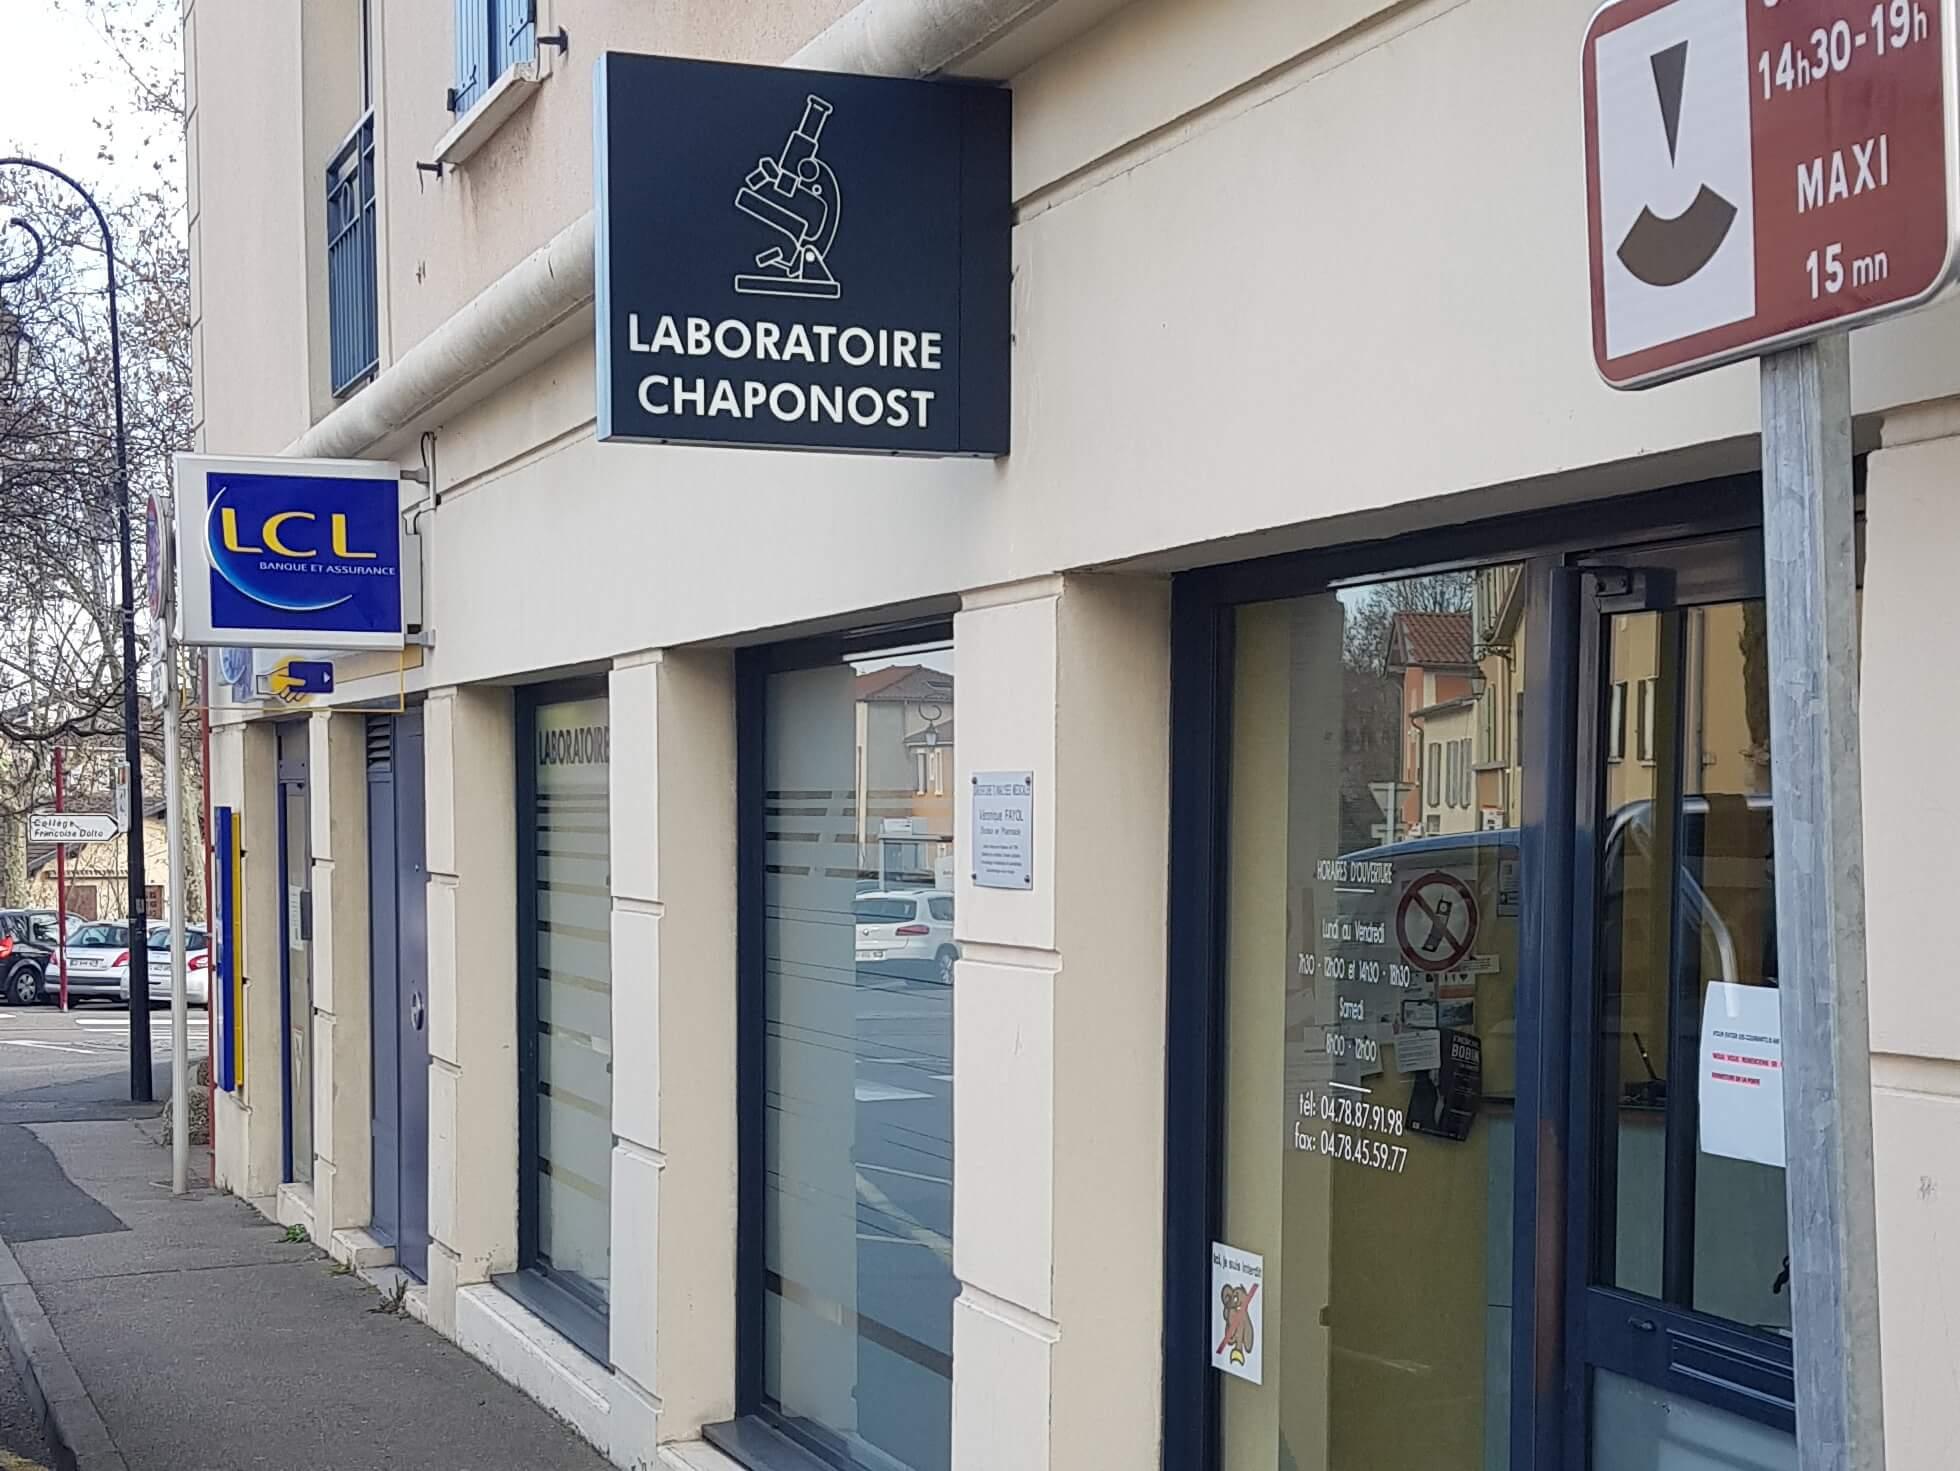 Installation Enseigne lumineuse Drapeau - SES Grigny -Lyon